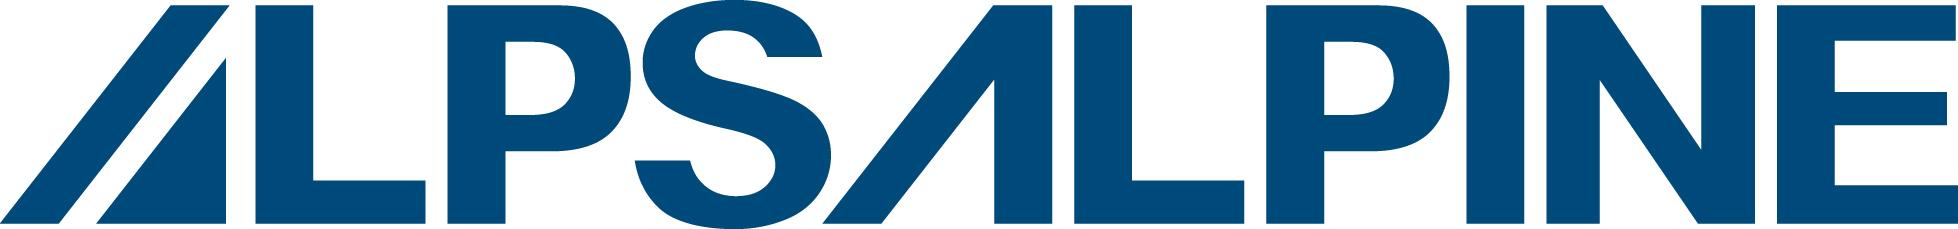 Alps Alpine Elektronik Elektronische Komponenten, Audiogeräte, Autonavigationssysteme